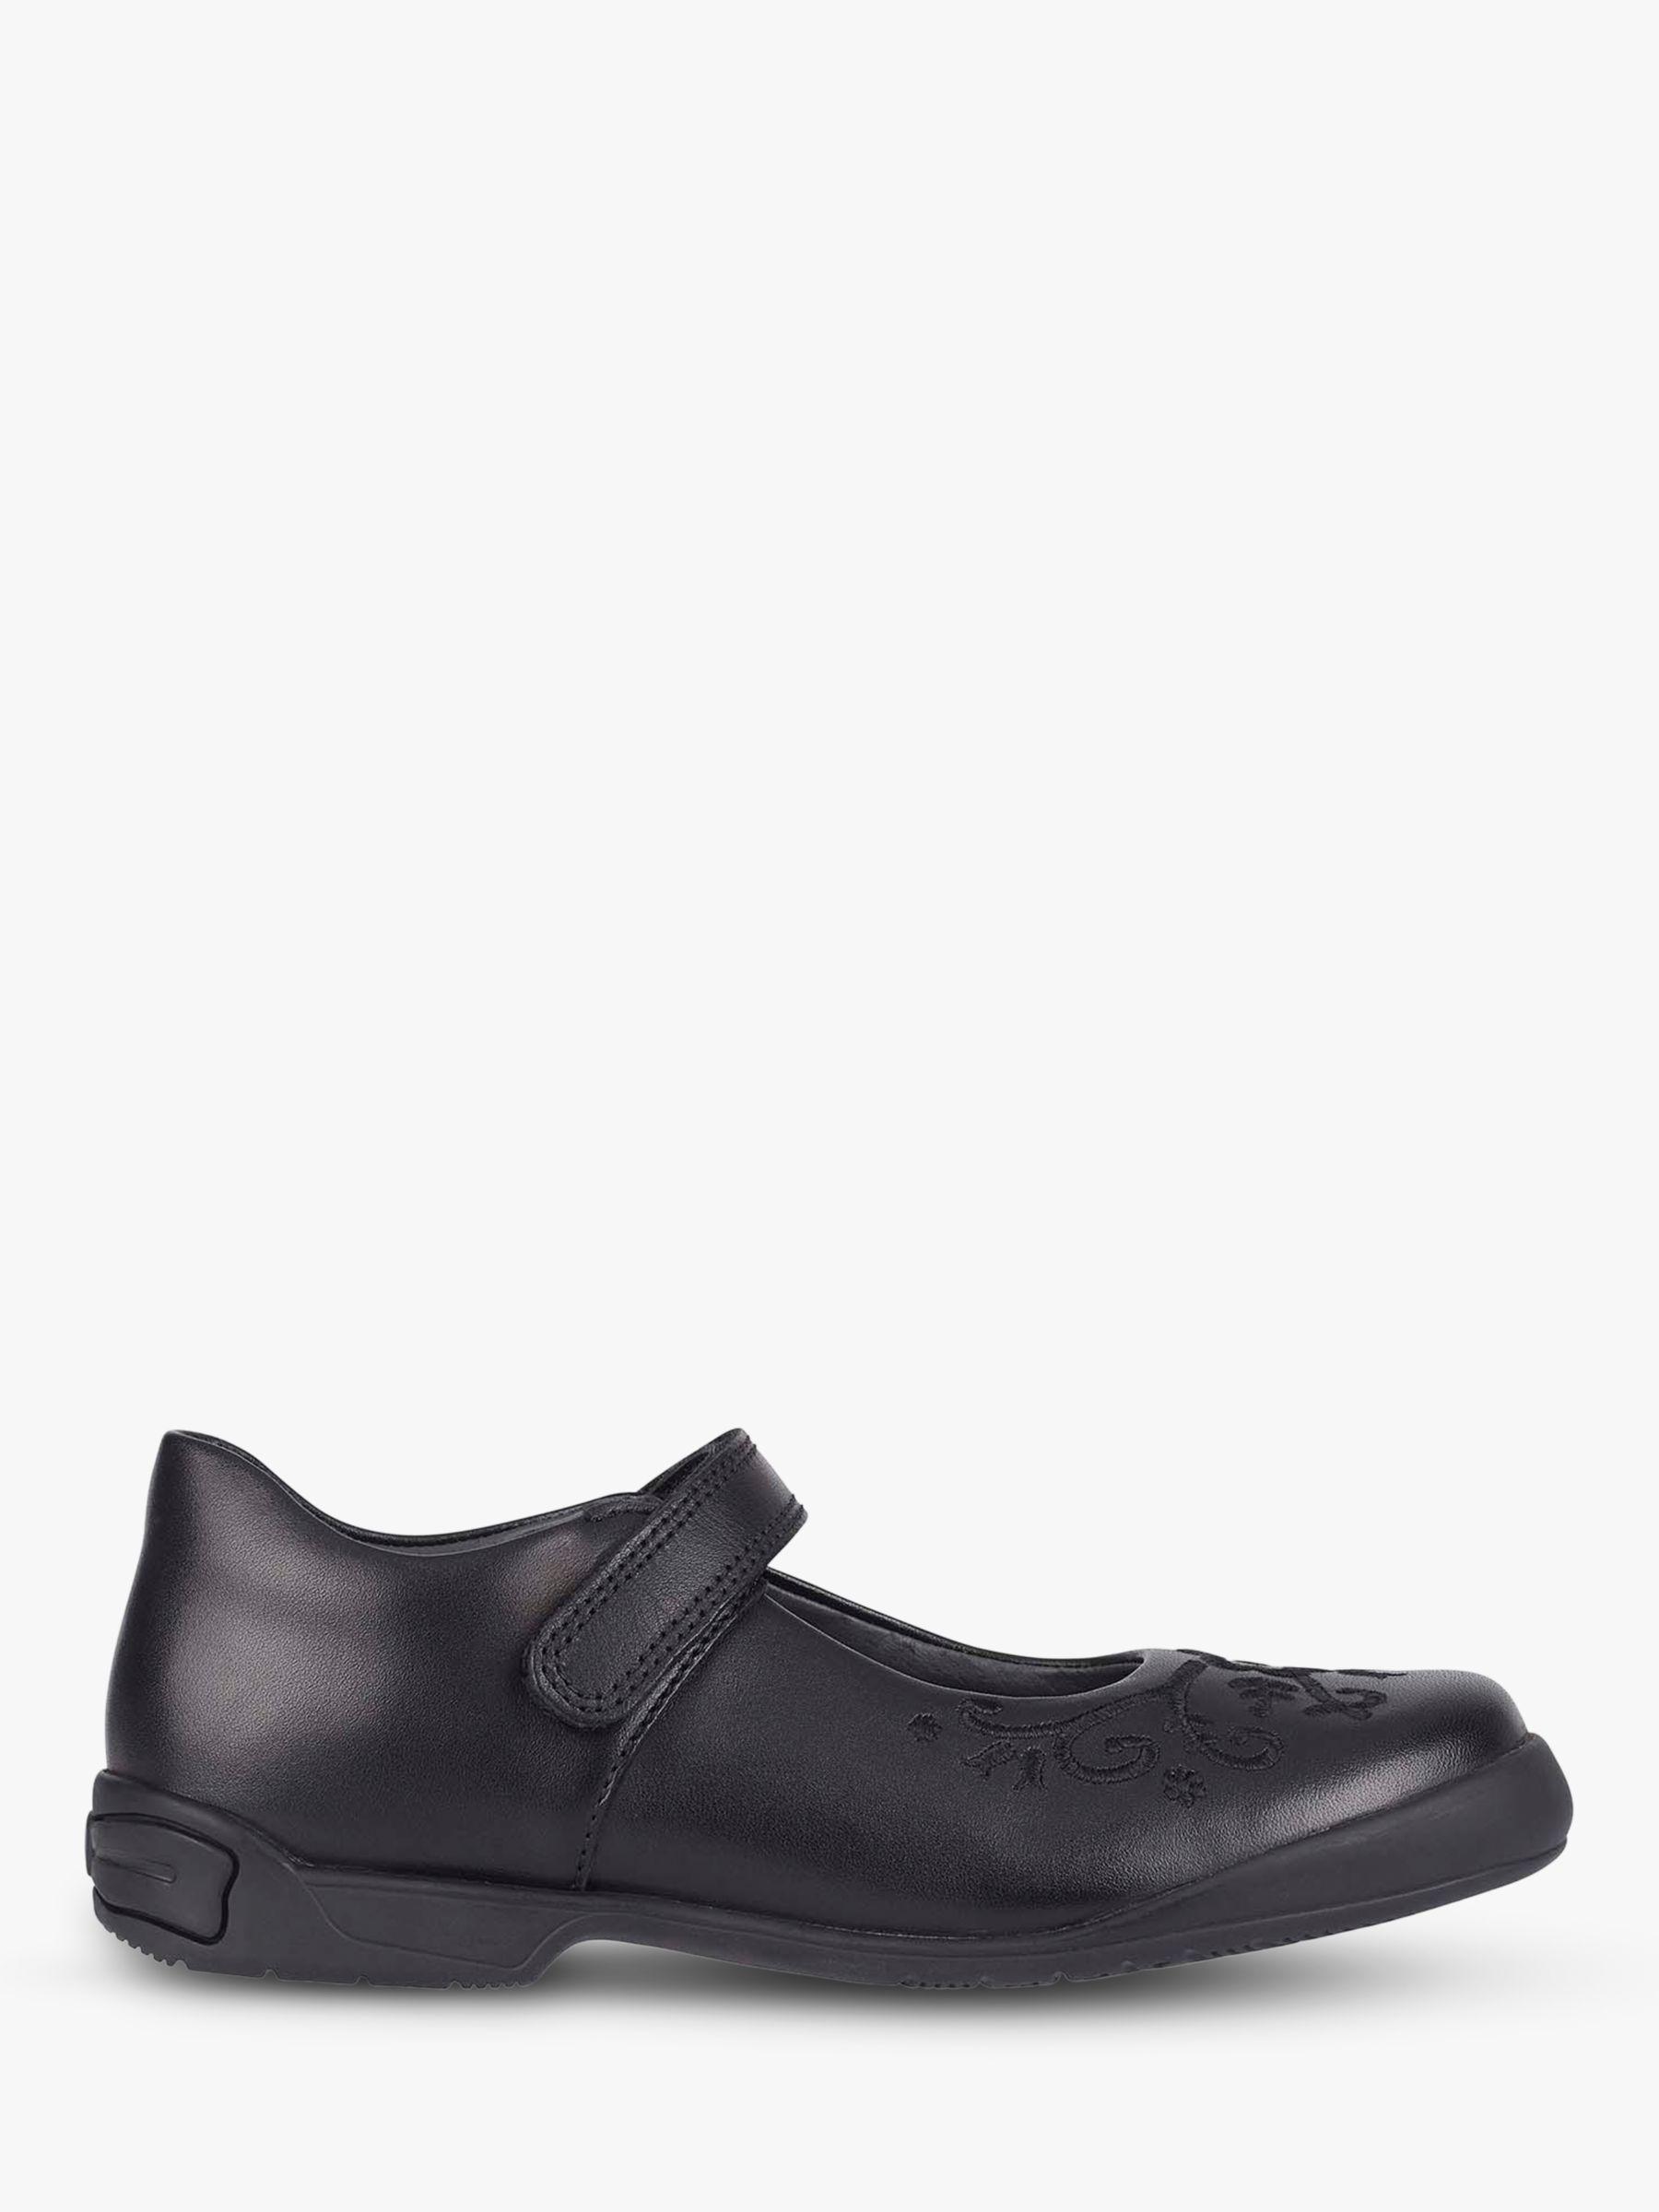 Start-Rite Start-rite Children's Hopscotch Leather Shoes, Black